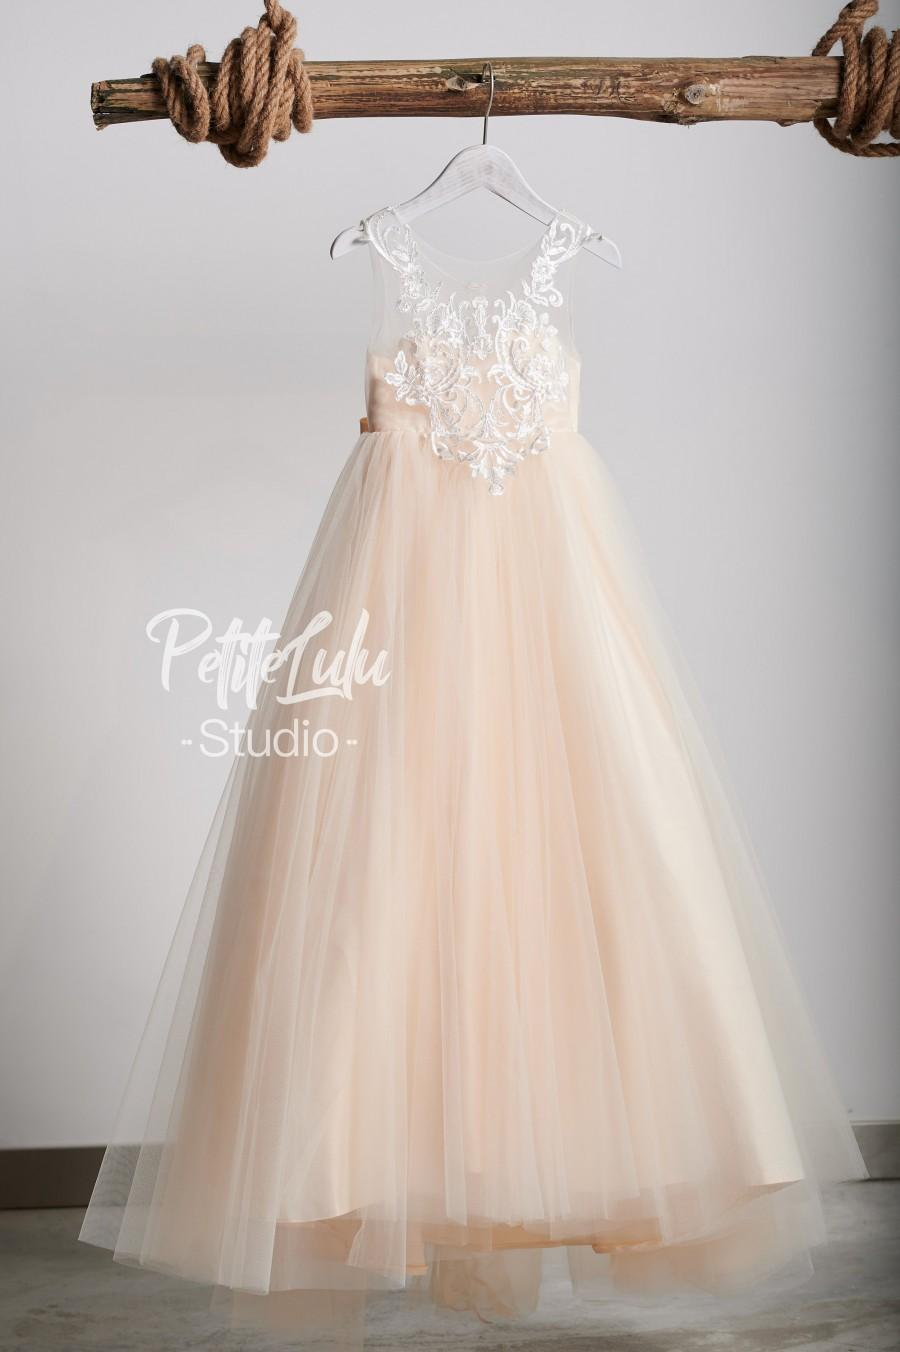 Mariage - Flower Girl Dress, Champagne,  Off-White, Floor Length, Girl Ball Gown Dress, Princess (D011)